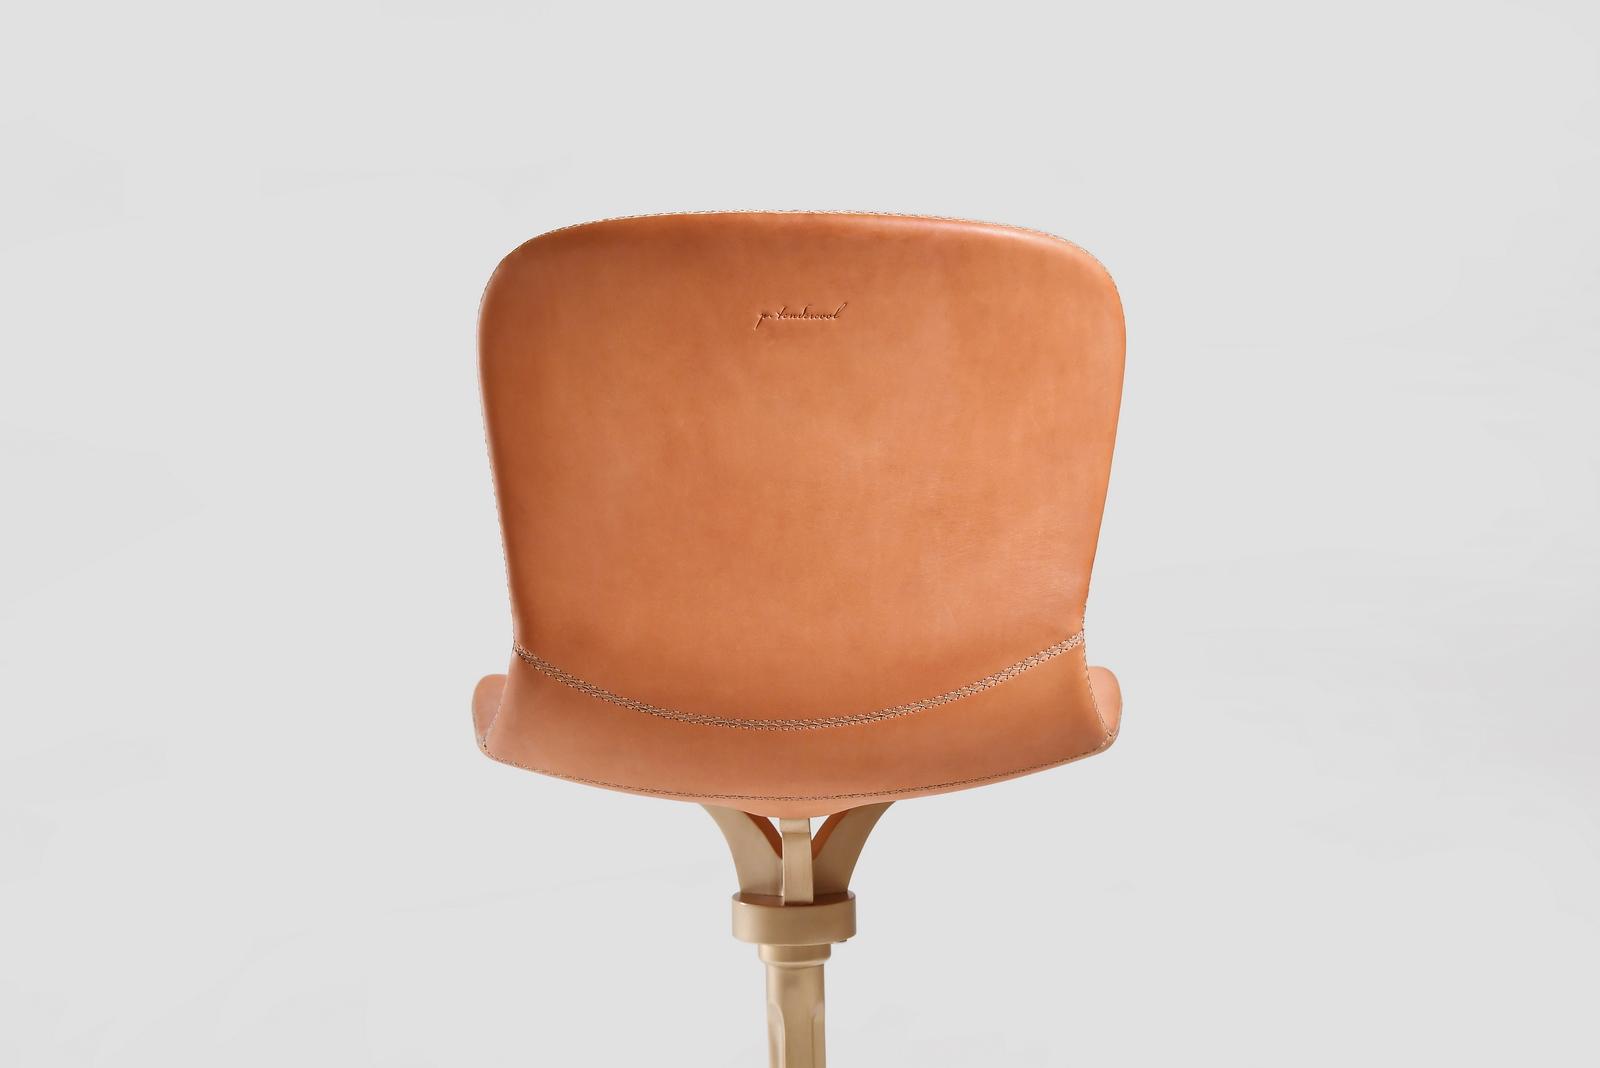 PTendercool-Chair-PT47-BS1-MB-200701-10